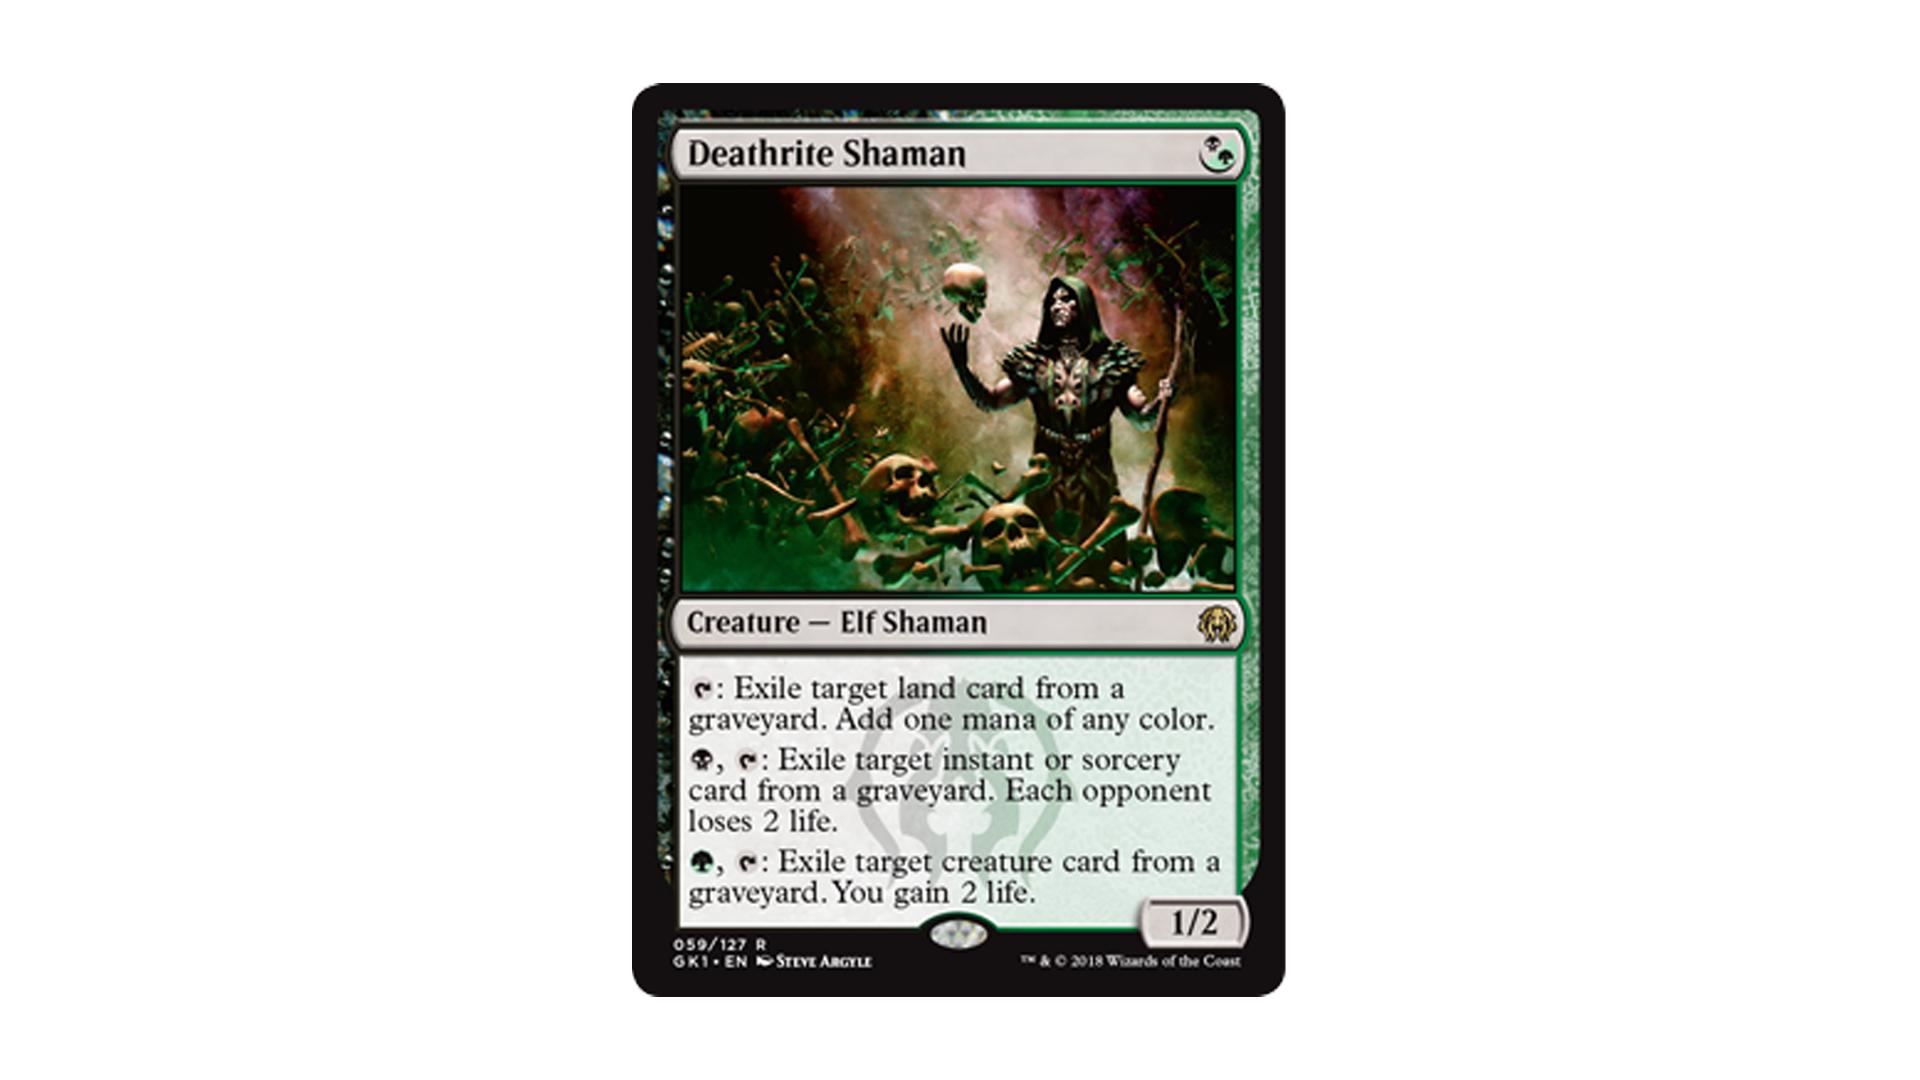 mtg-card-deathrite-shaman.png